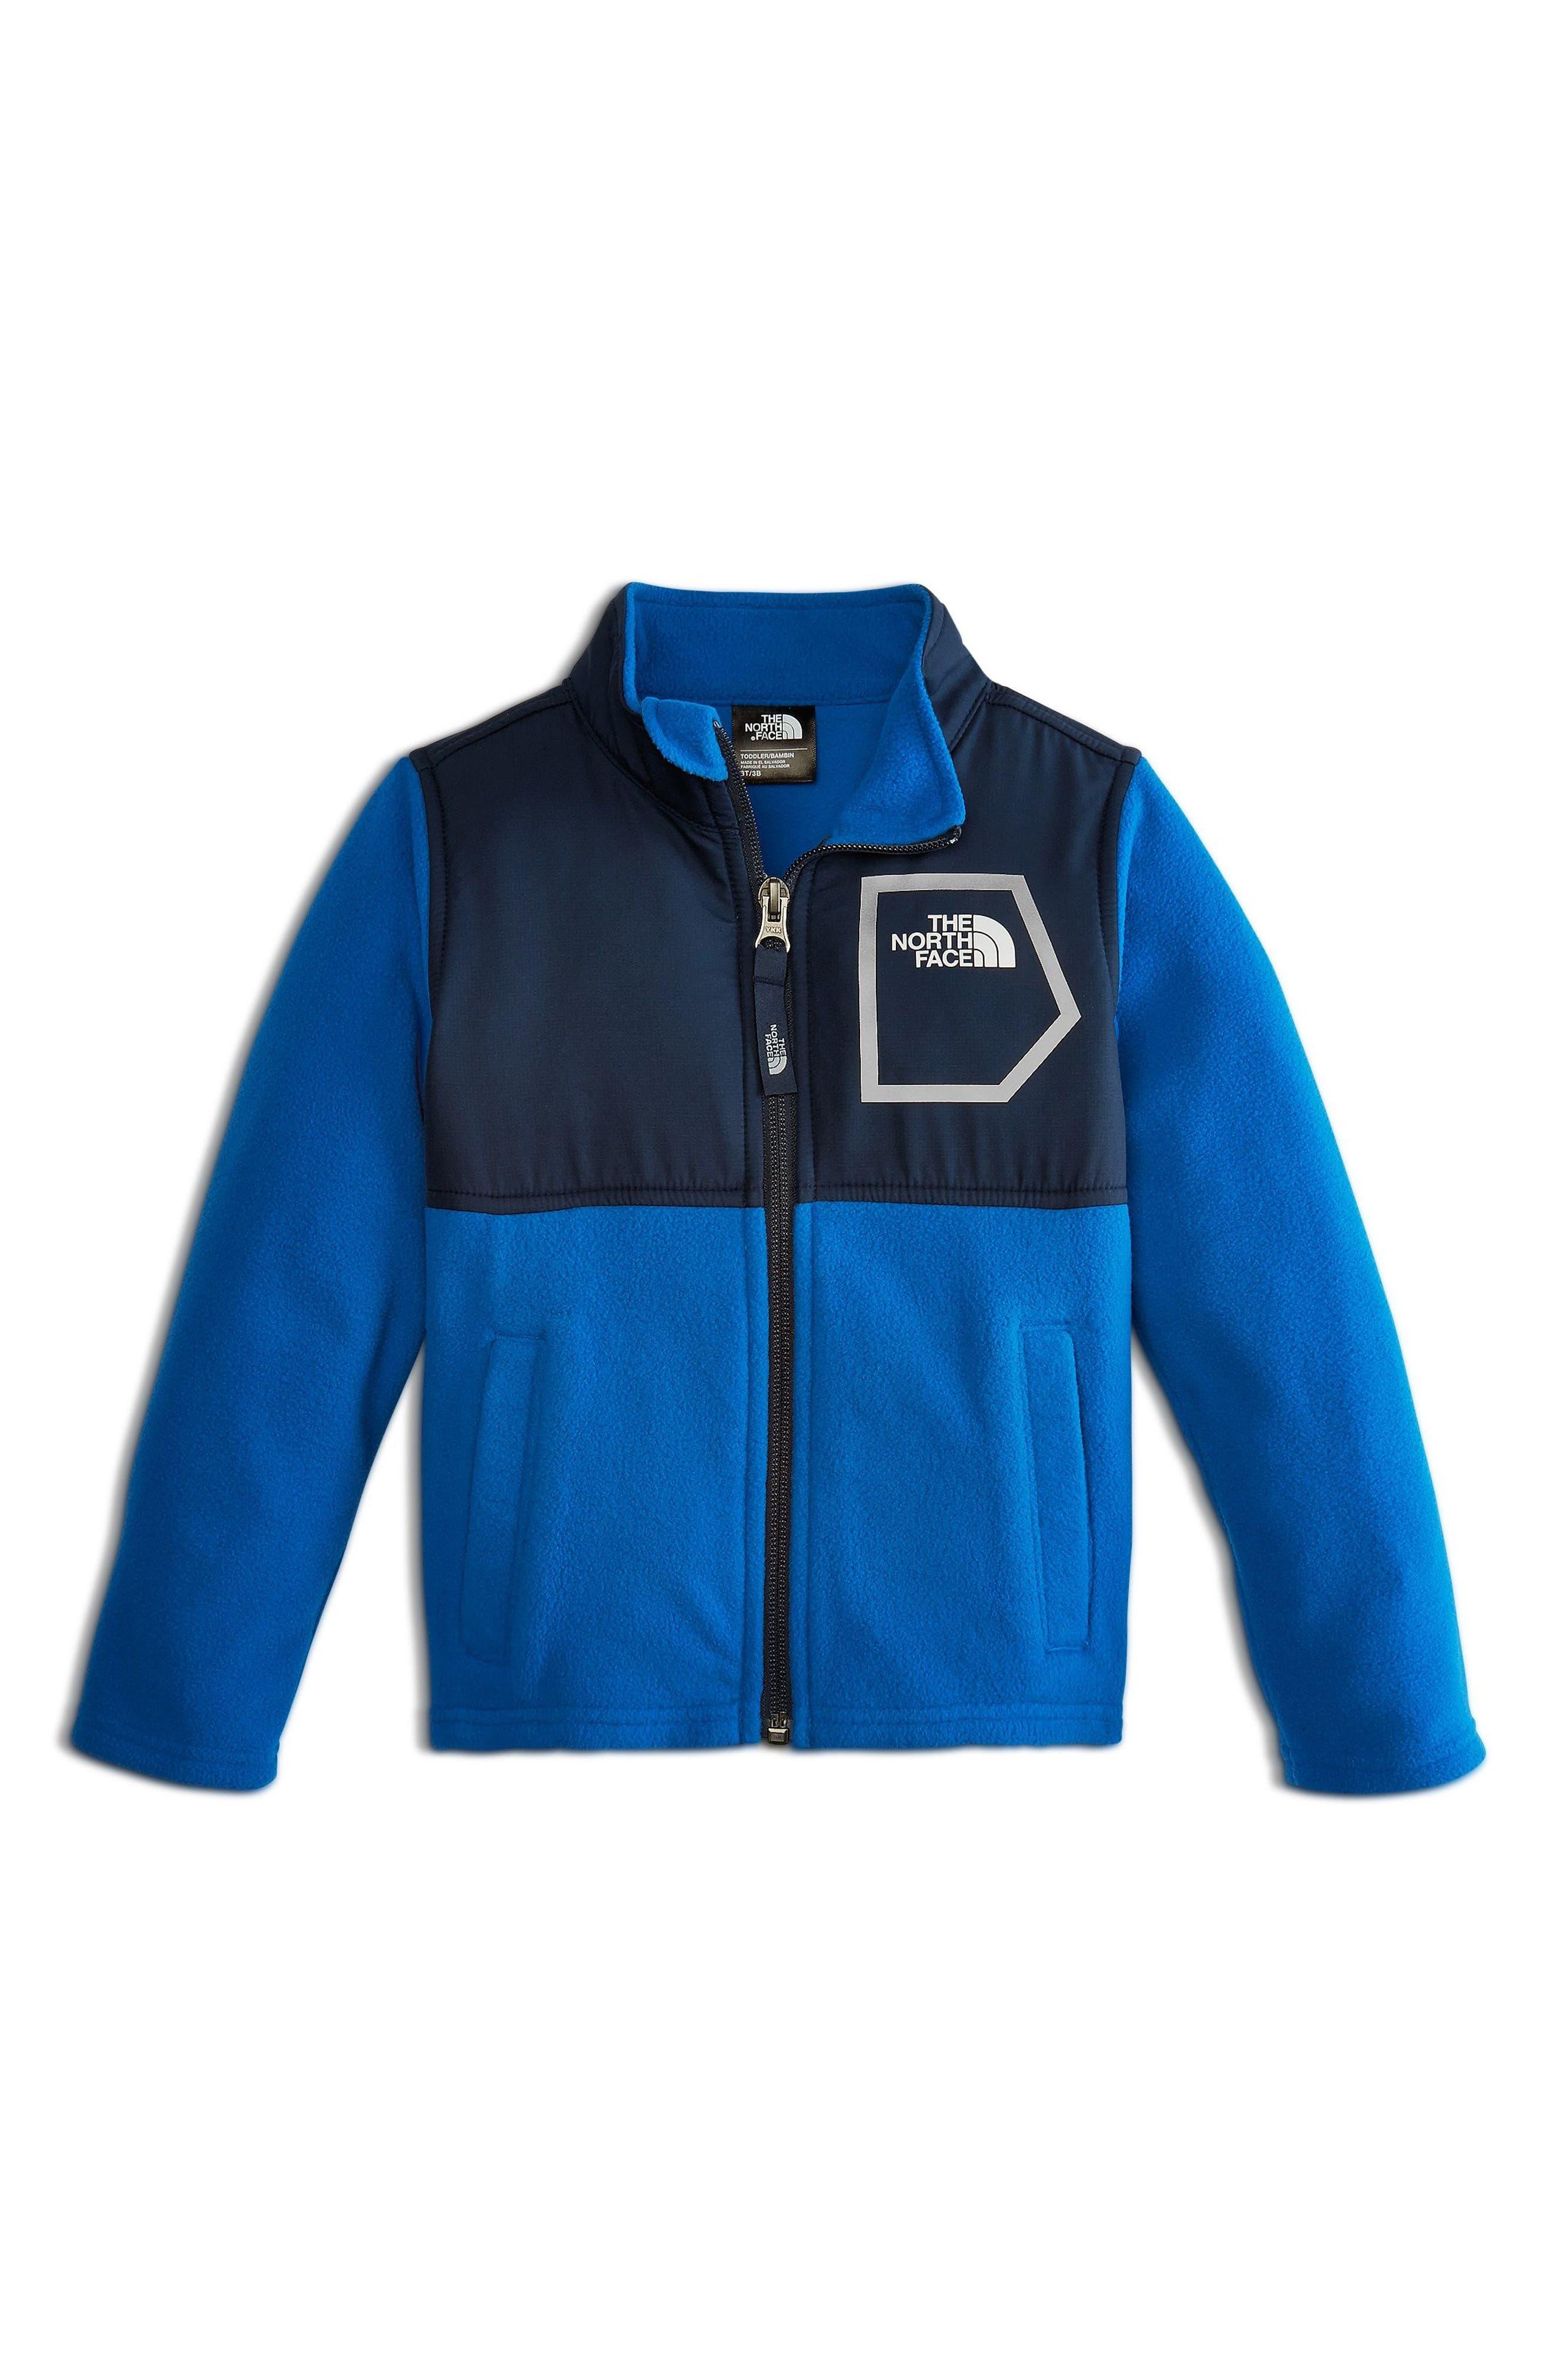 The North Face Glacier Track Jacket (Toddler Boys & Little Boys)